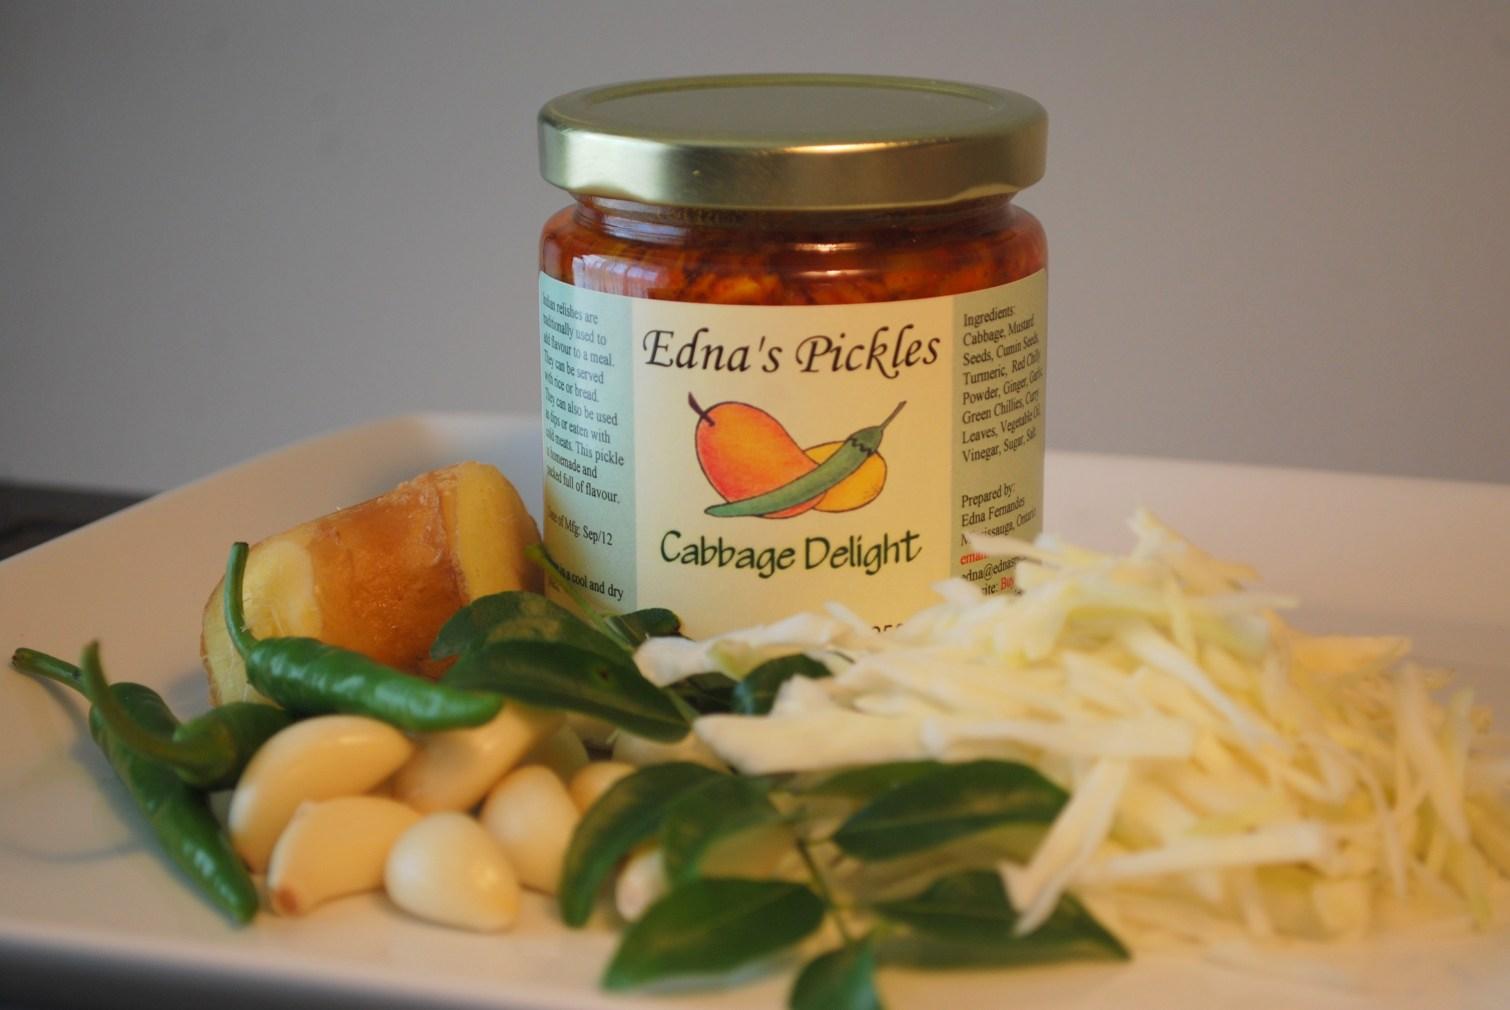 Edna's artisan pickles cabbage delight